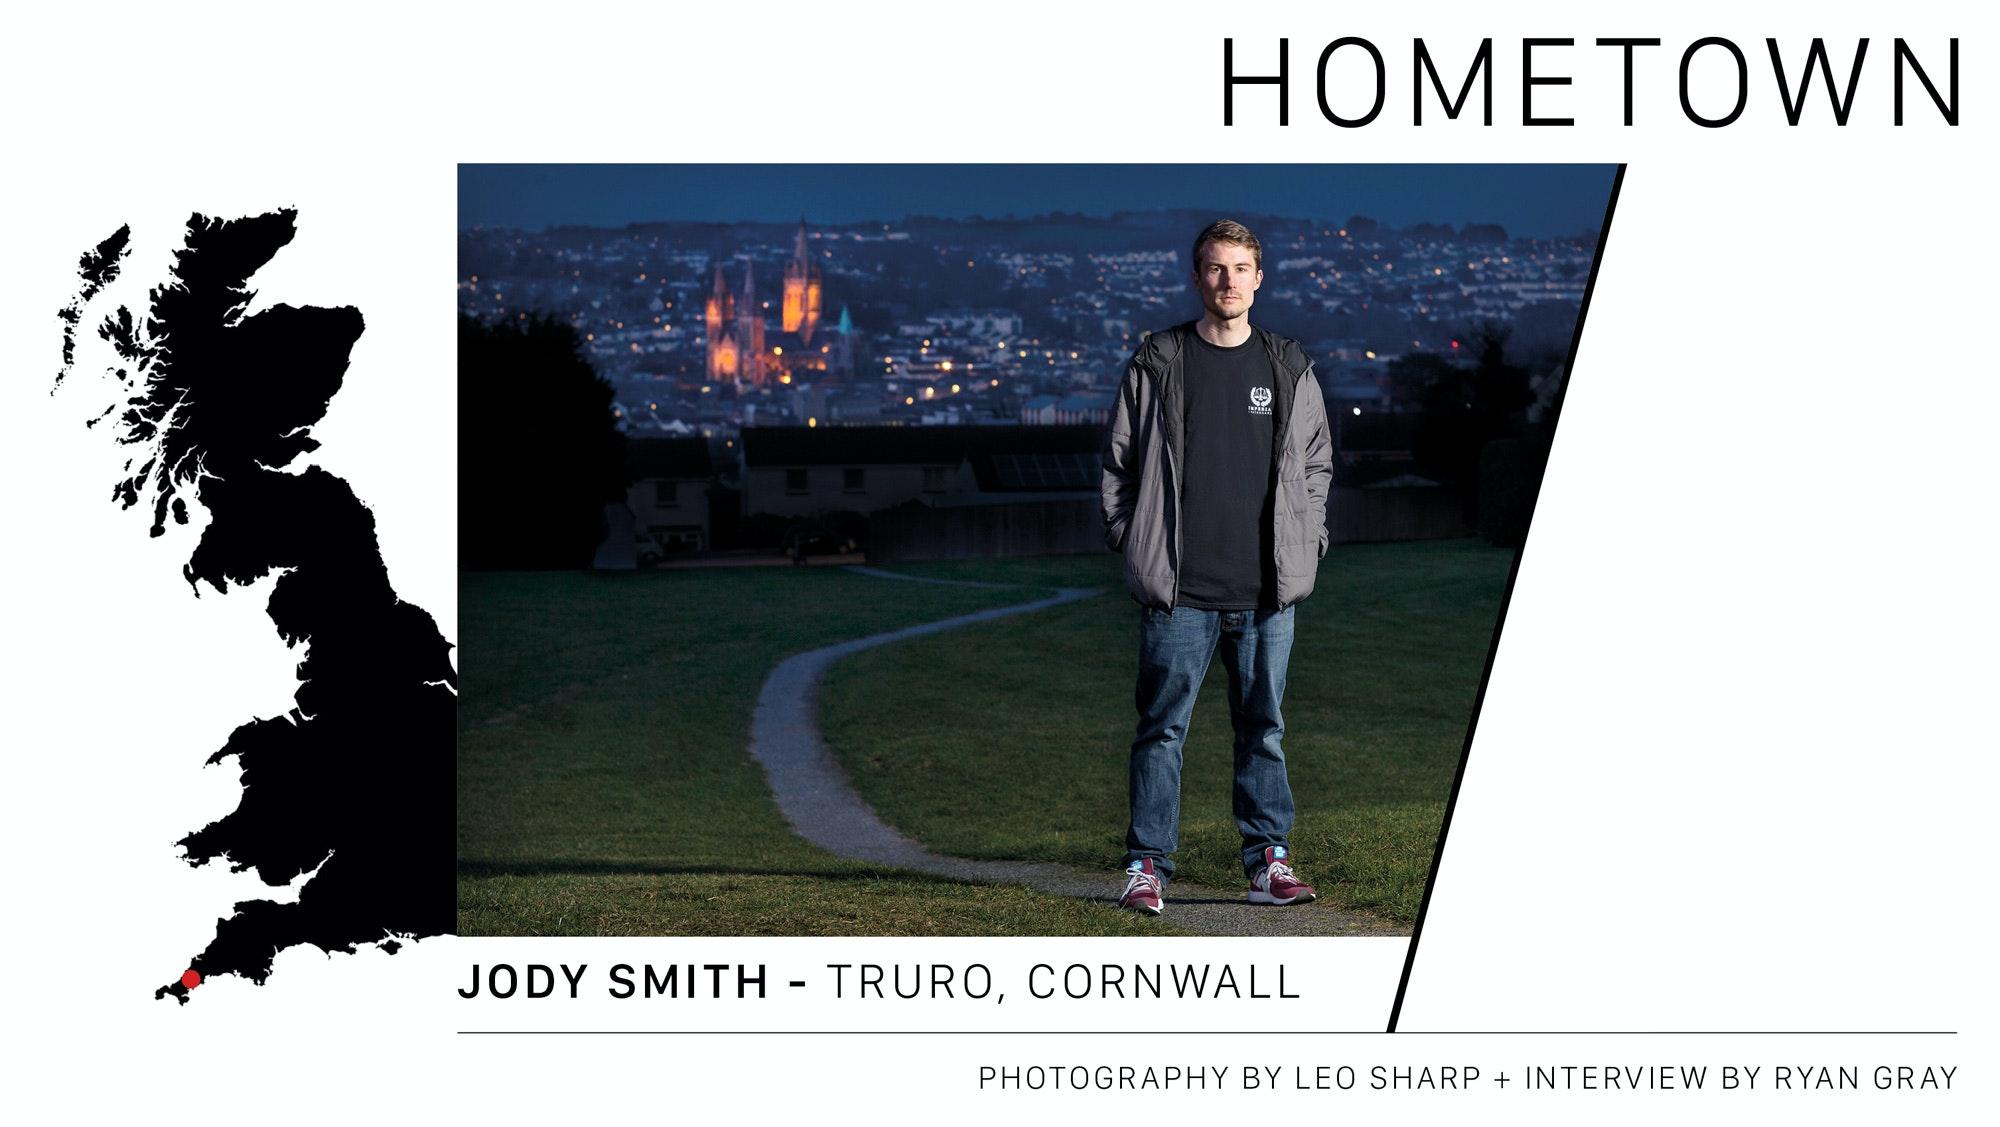 Jody Smith – Hometown